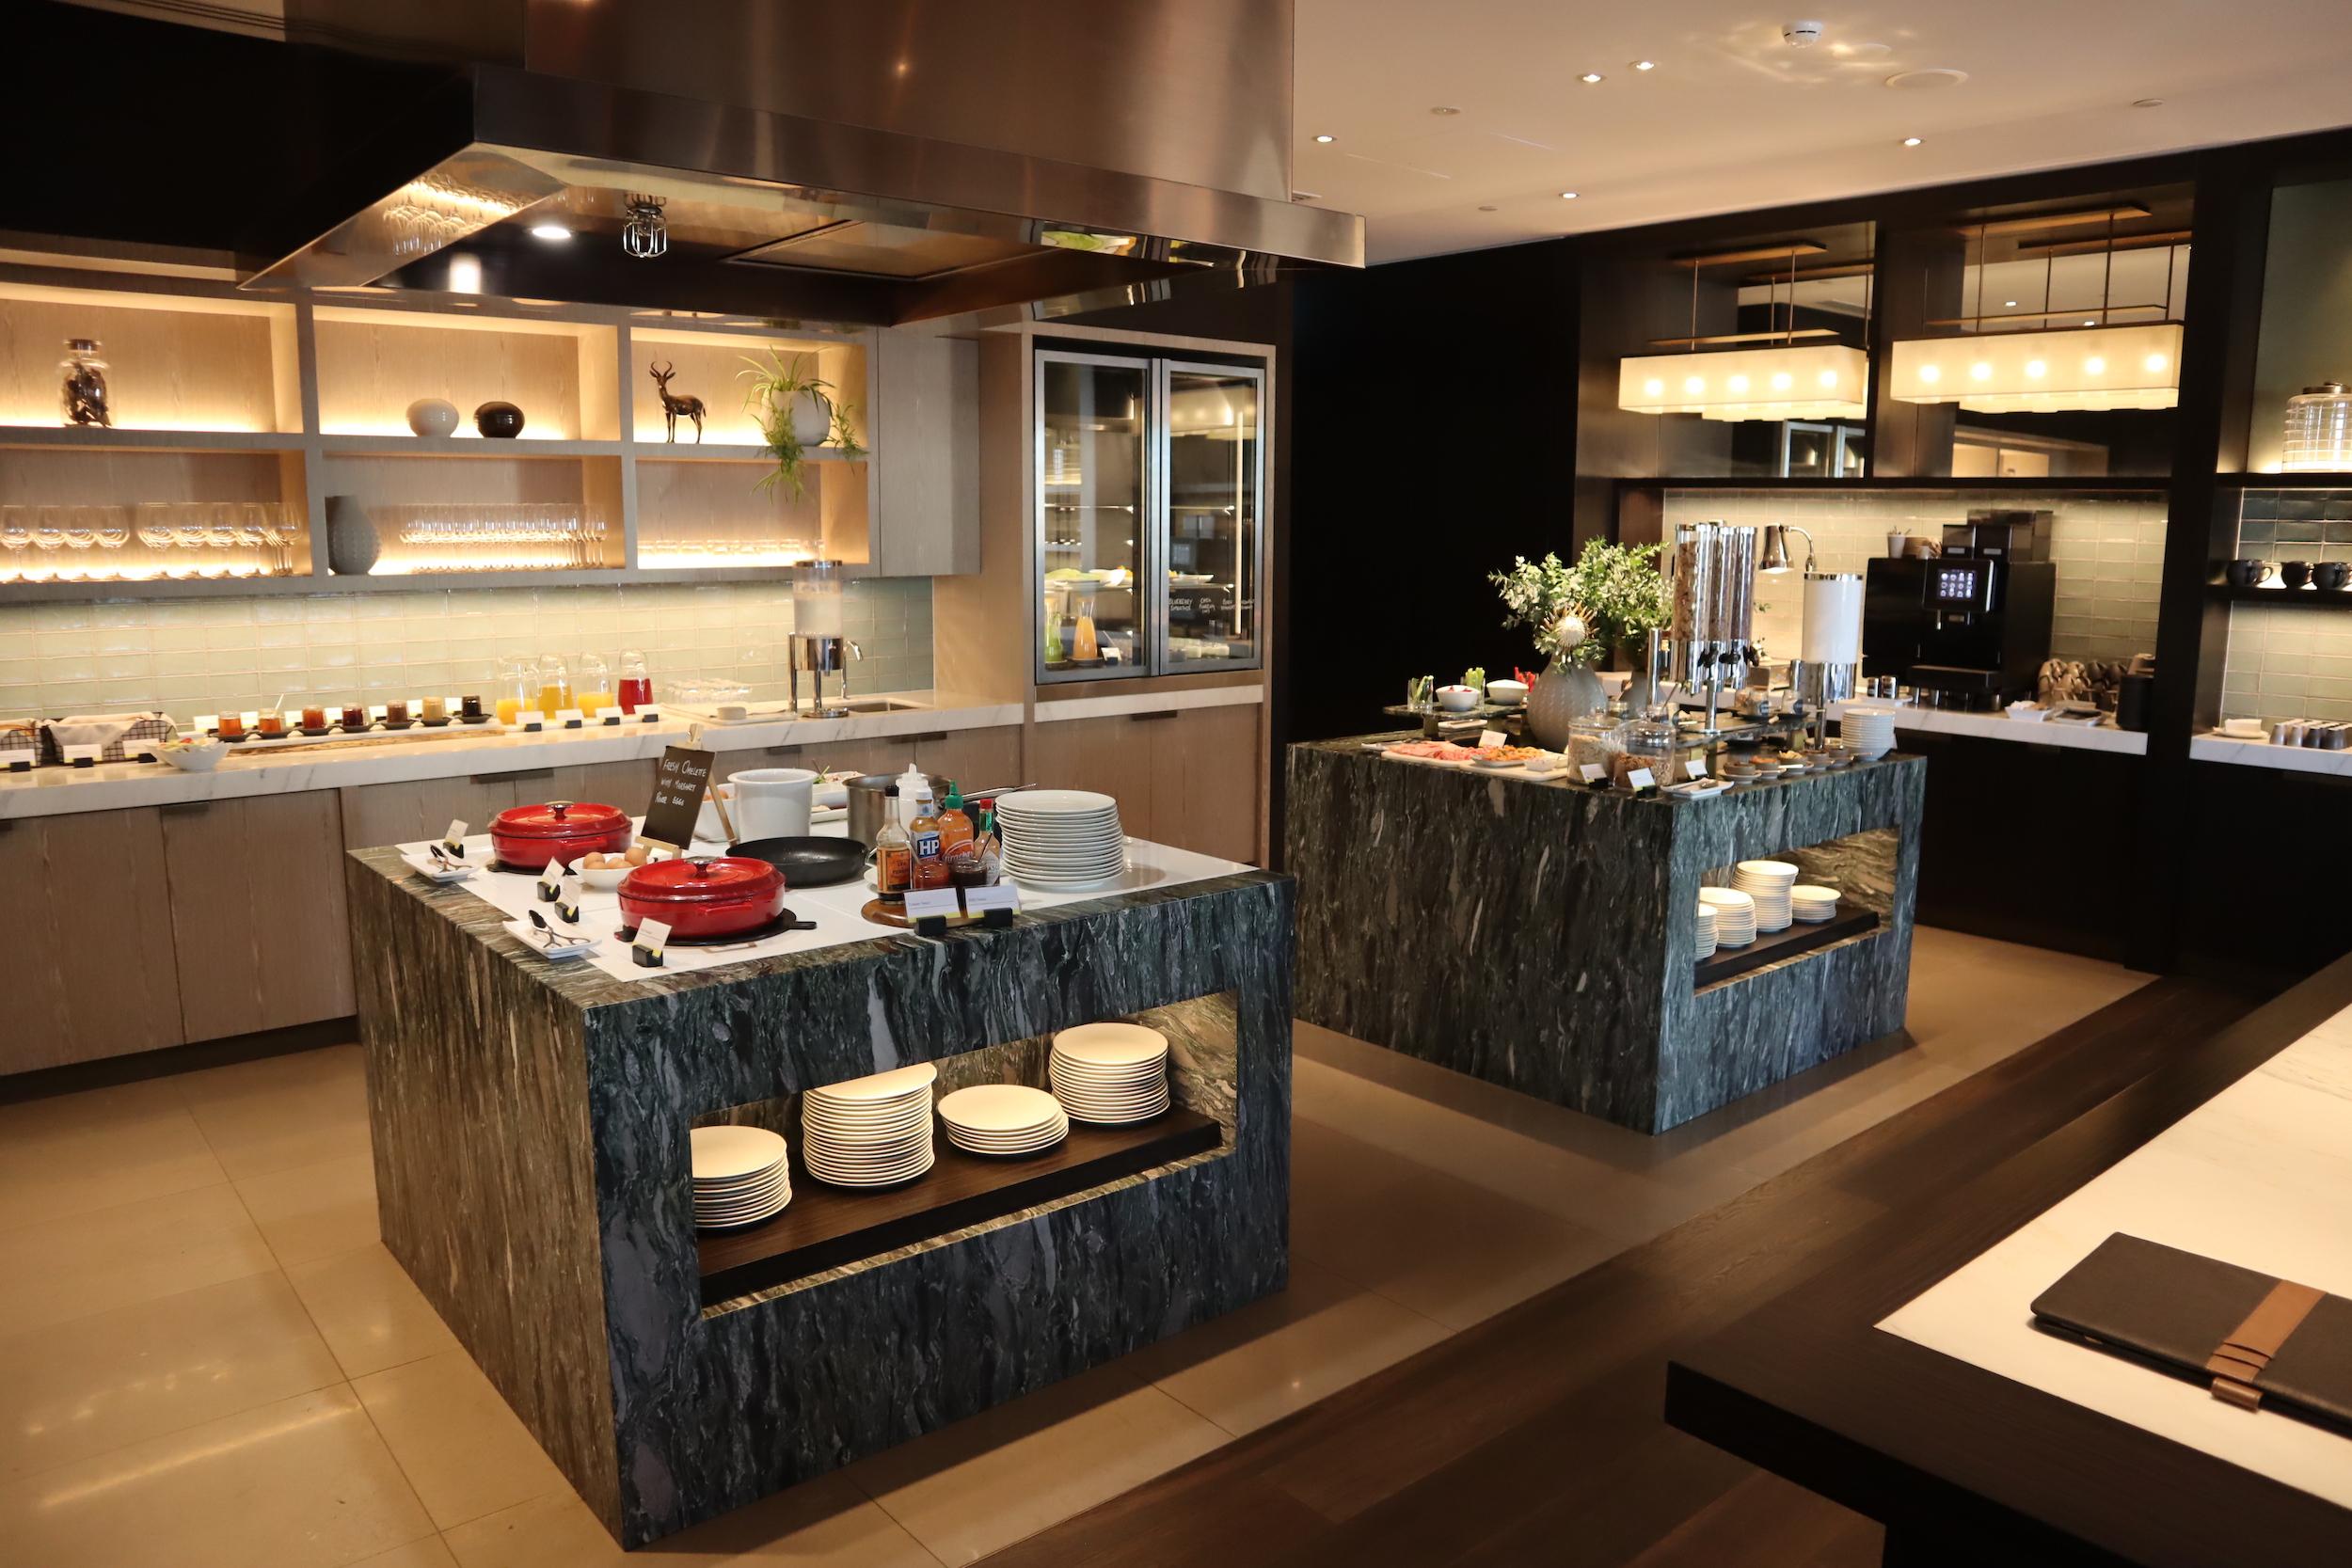 Westin Perth – Executive Lounge breakfast spread